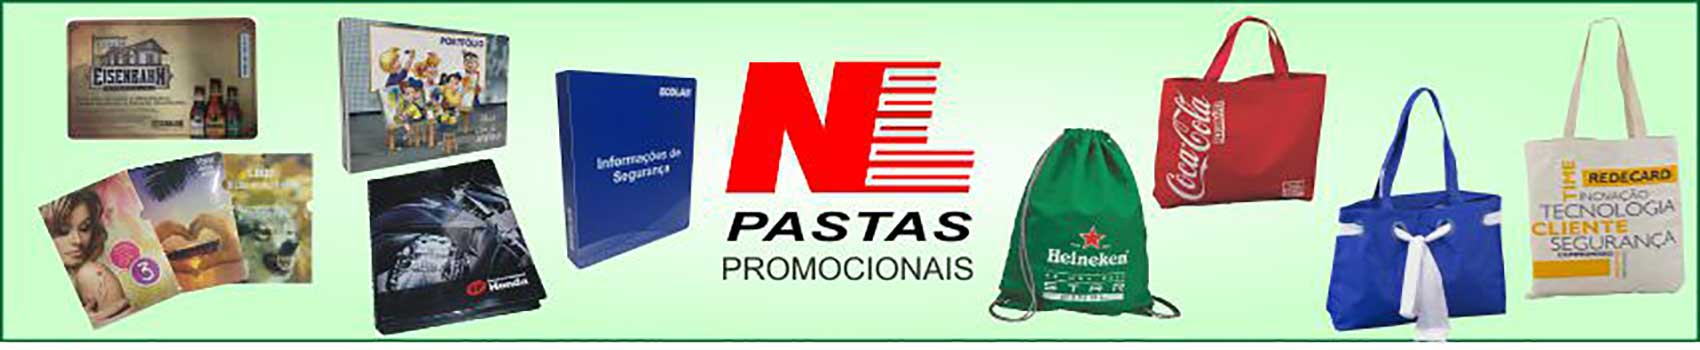 NL Pastas